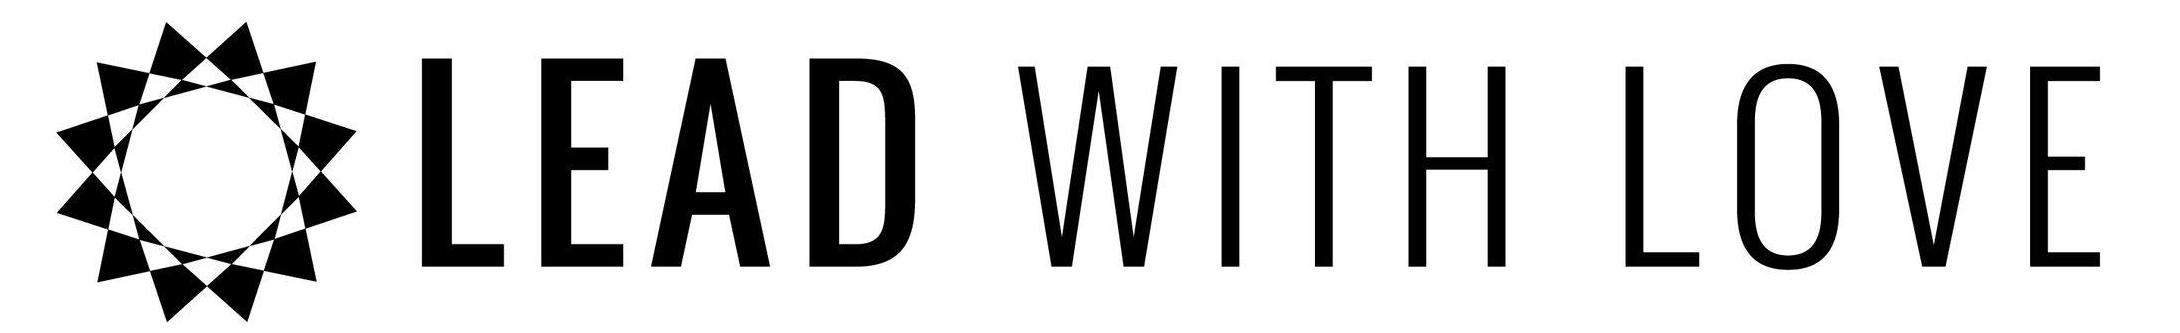 18-LWL-Logo-Landscape-Black1-01.jpg